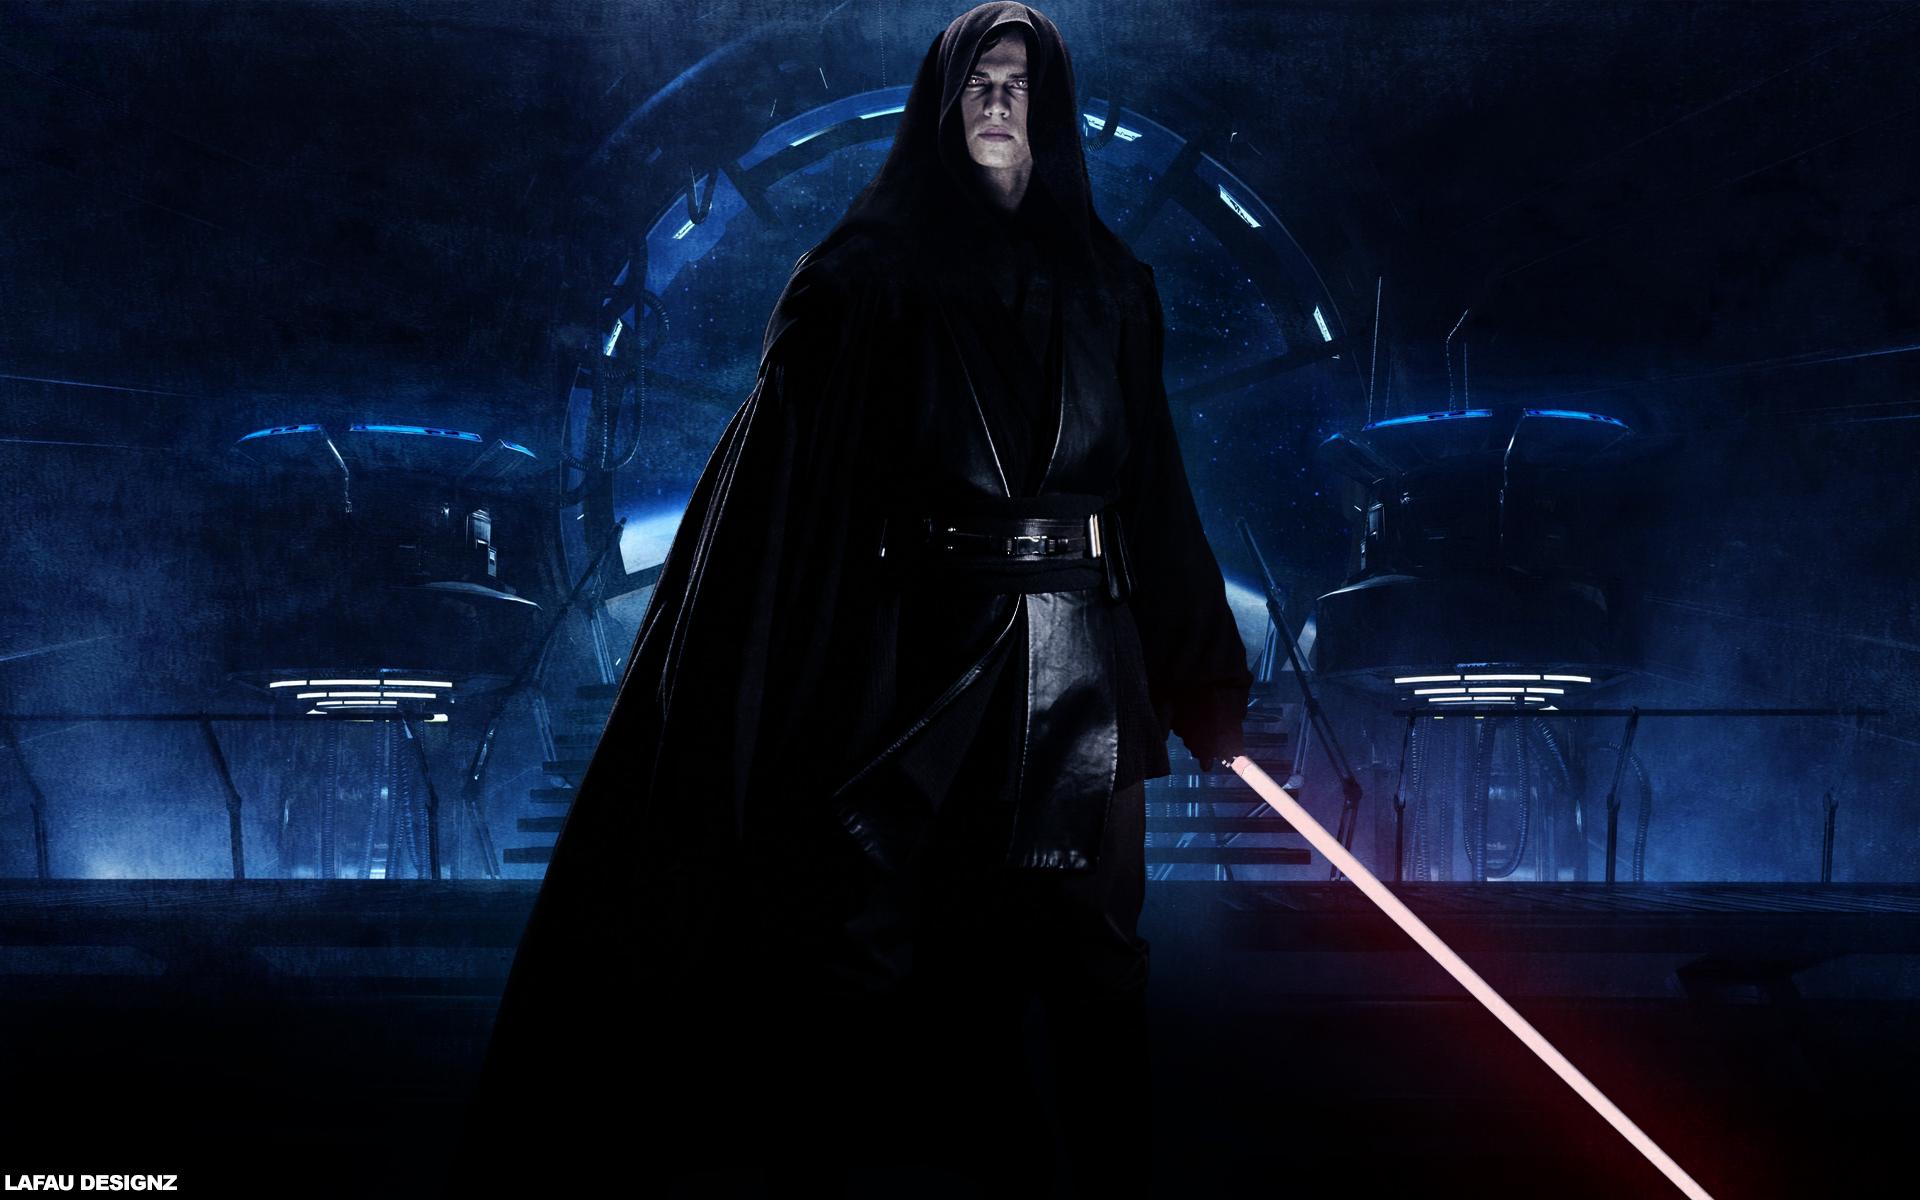 Anakin Skywalker Star Wars Wallpaper Lafaudesignz 1920x1200